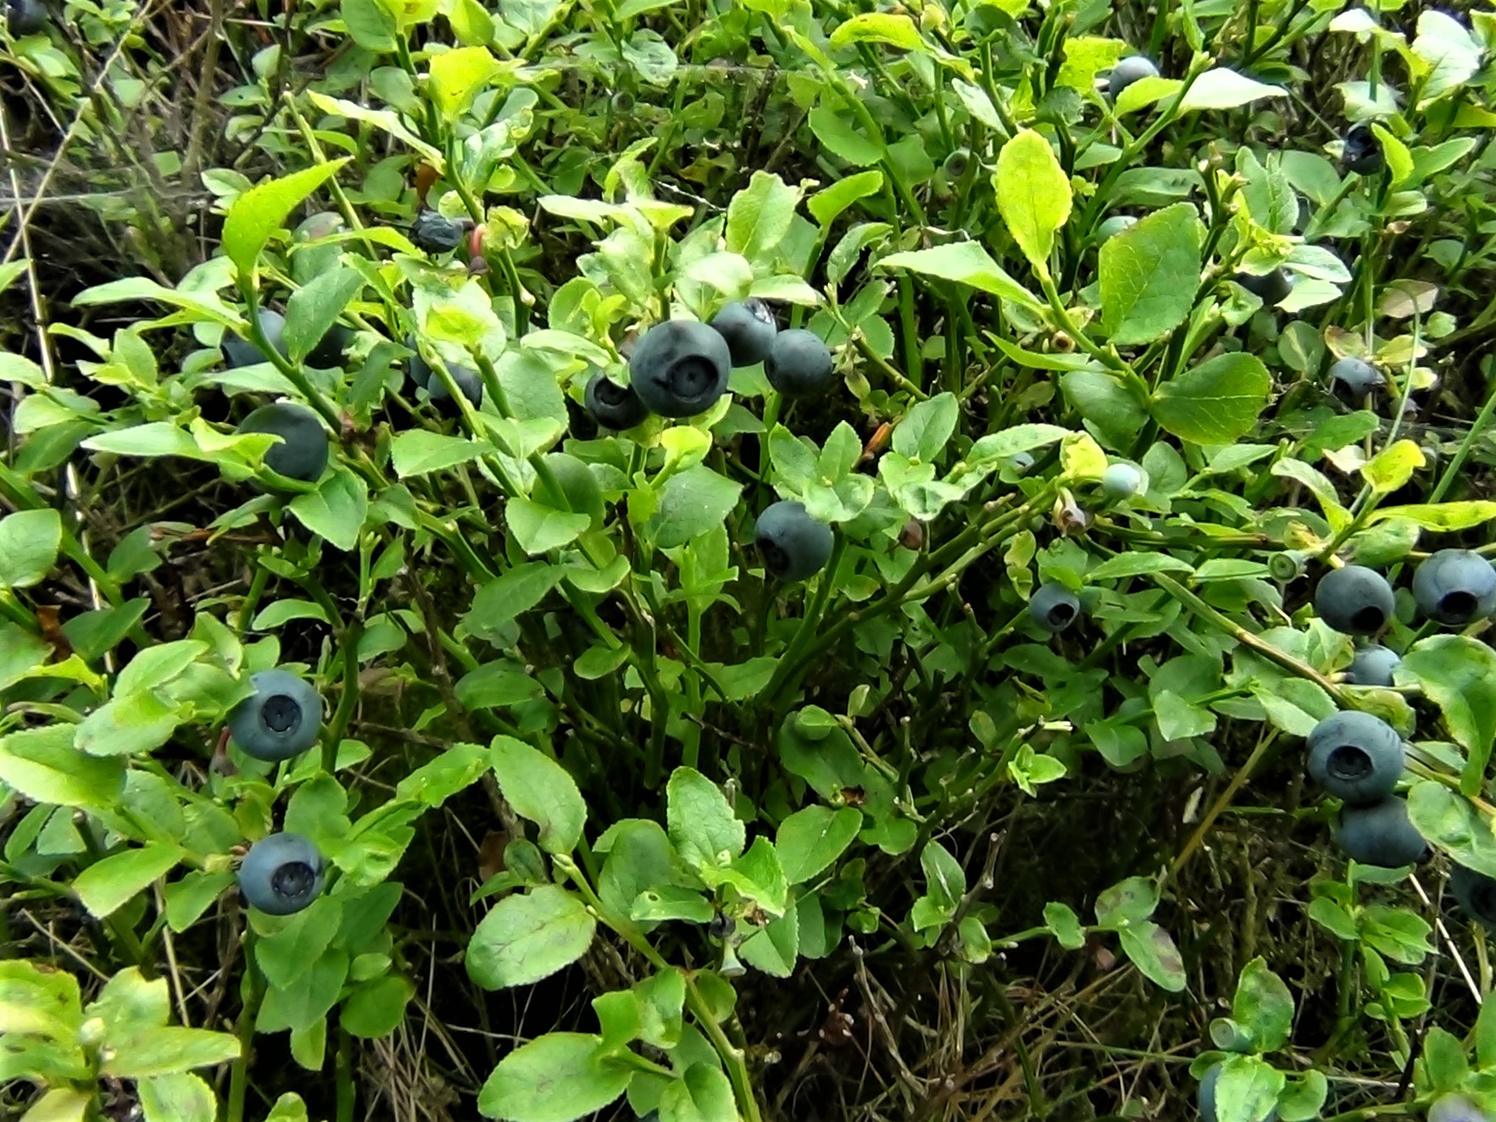 bilberry blaeberry whortleberry whinberry windberry myrtle